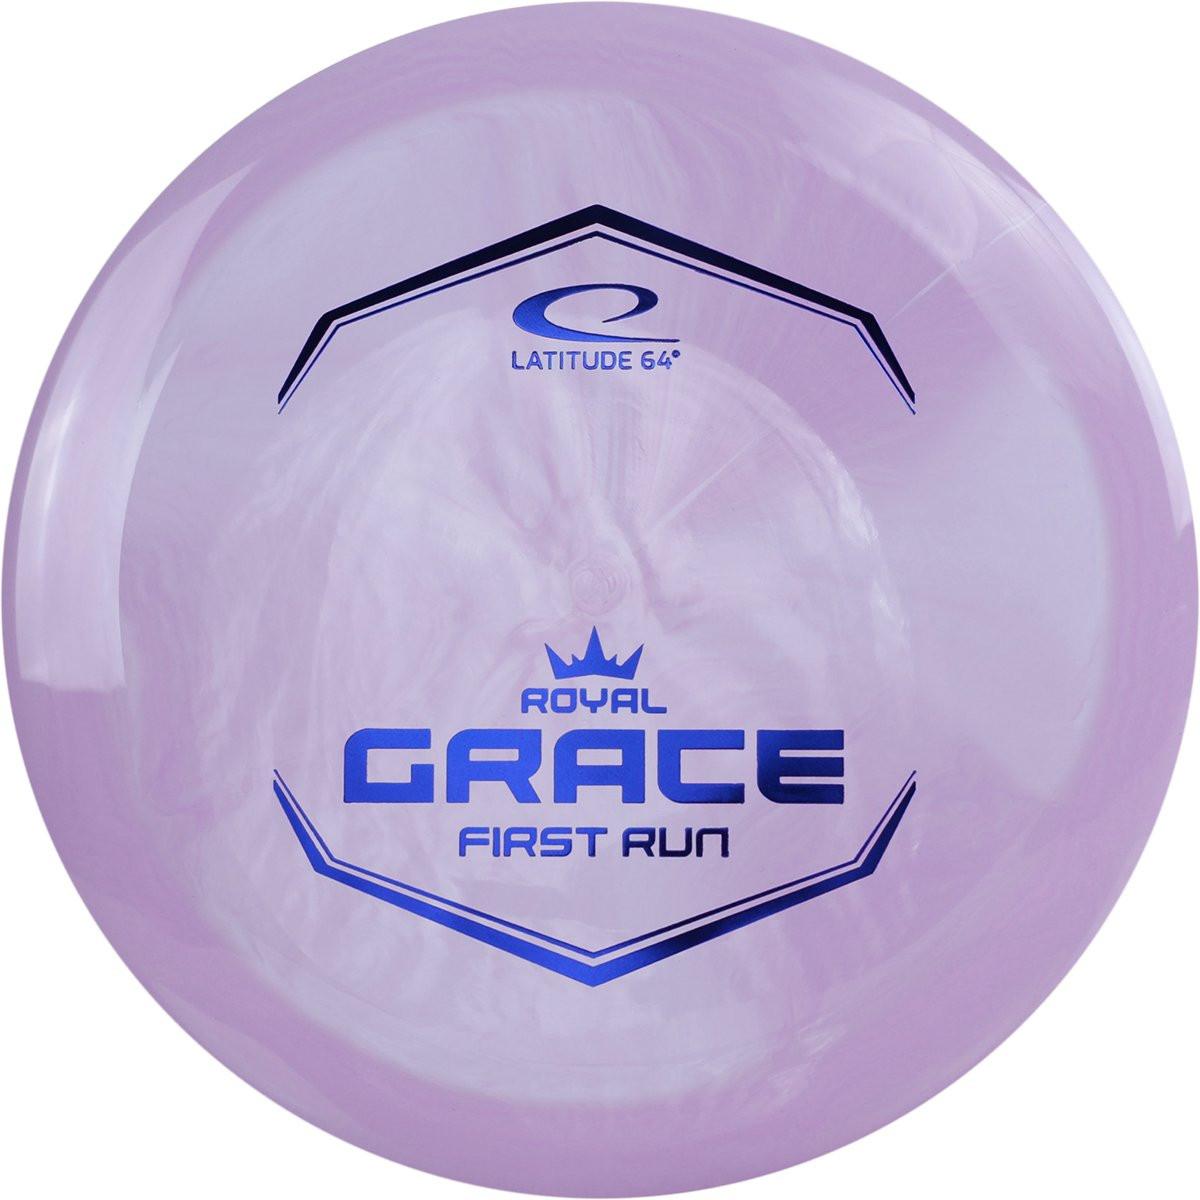 Latitude 64 Royal Grand Grace First Run